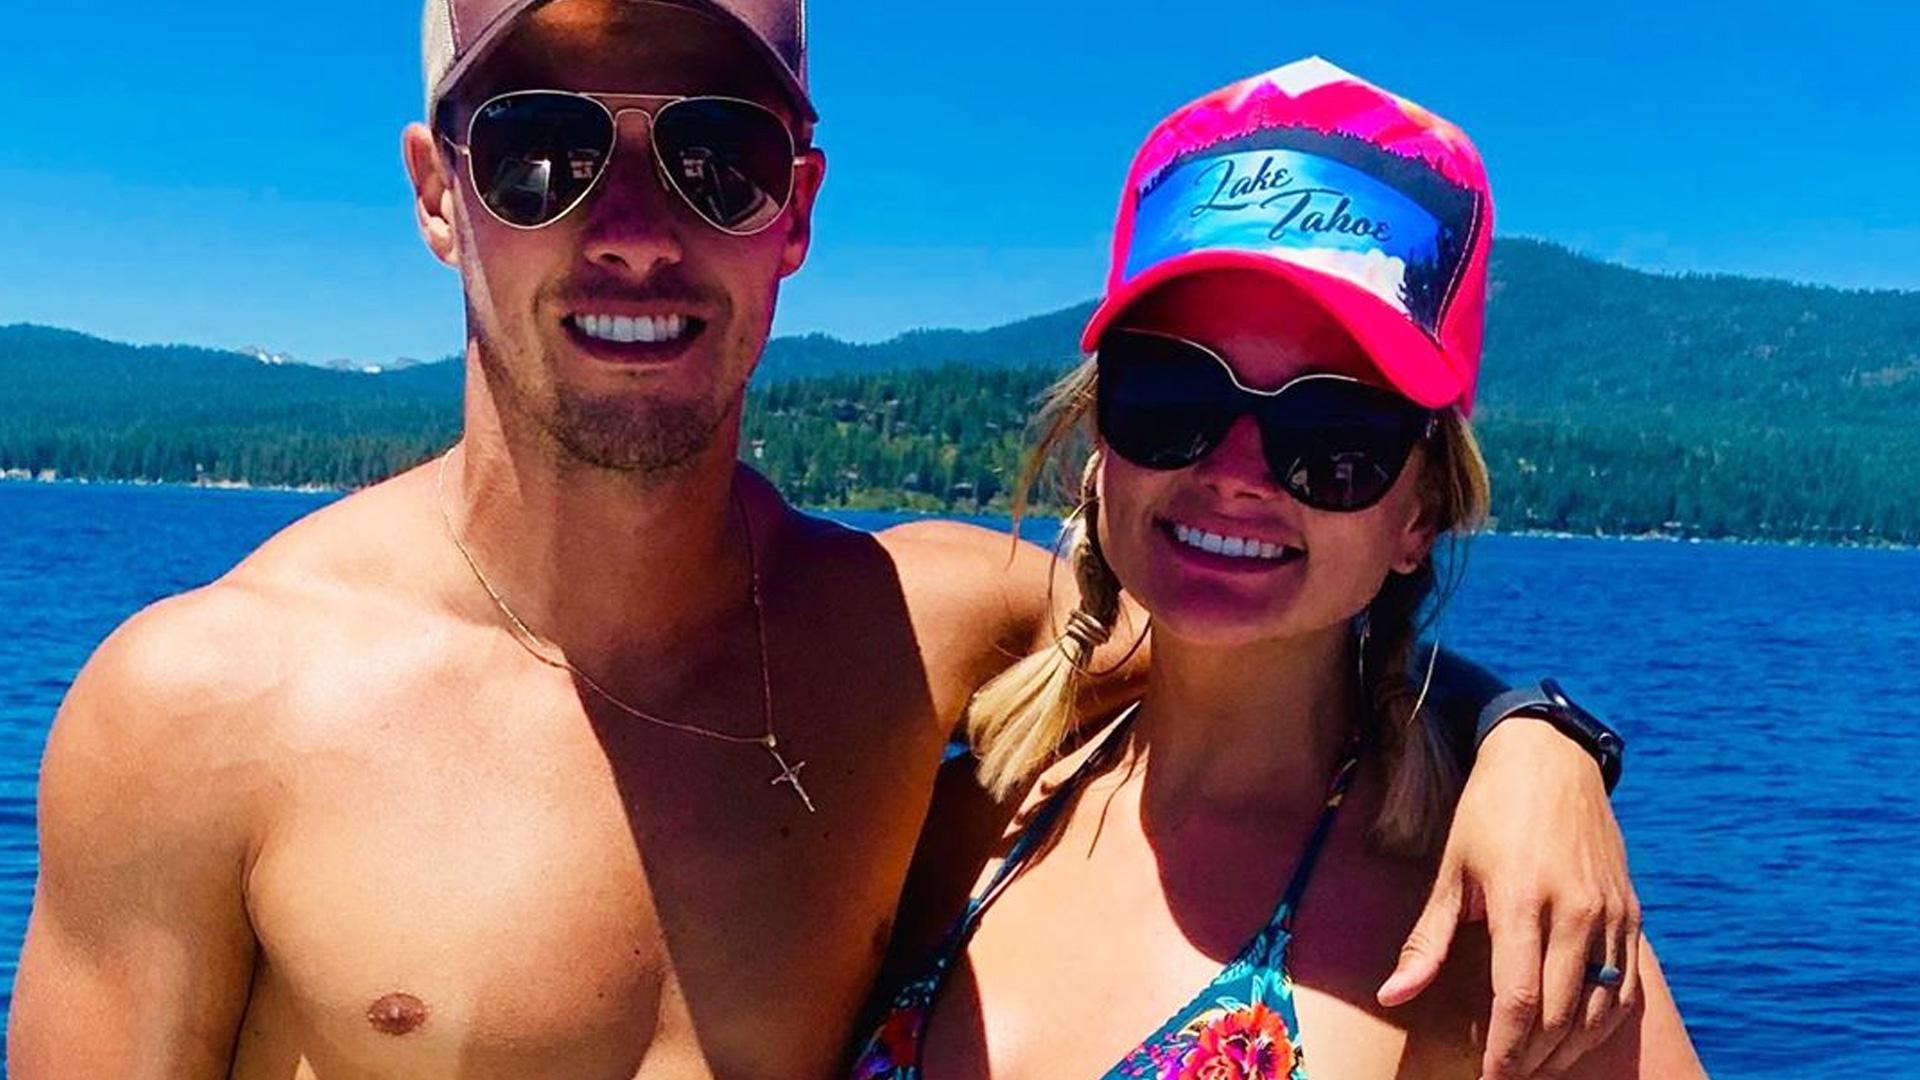 Miranda Lambert Poses In Bikini With Shirtless Husband